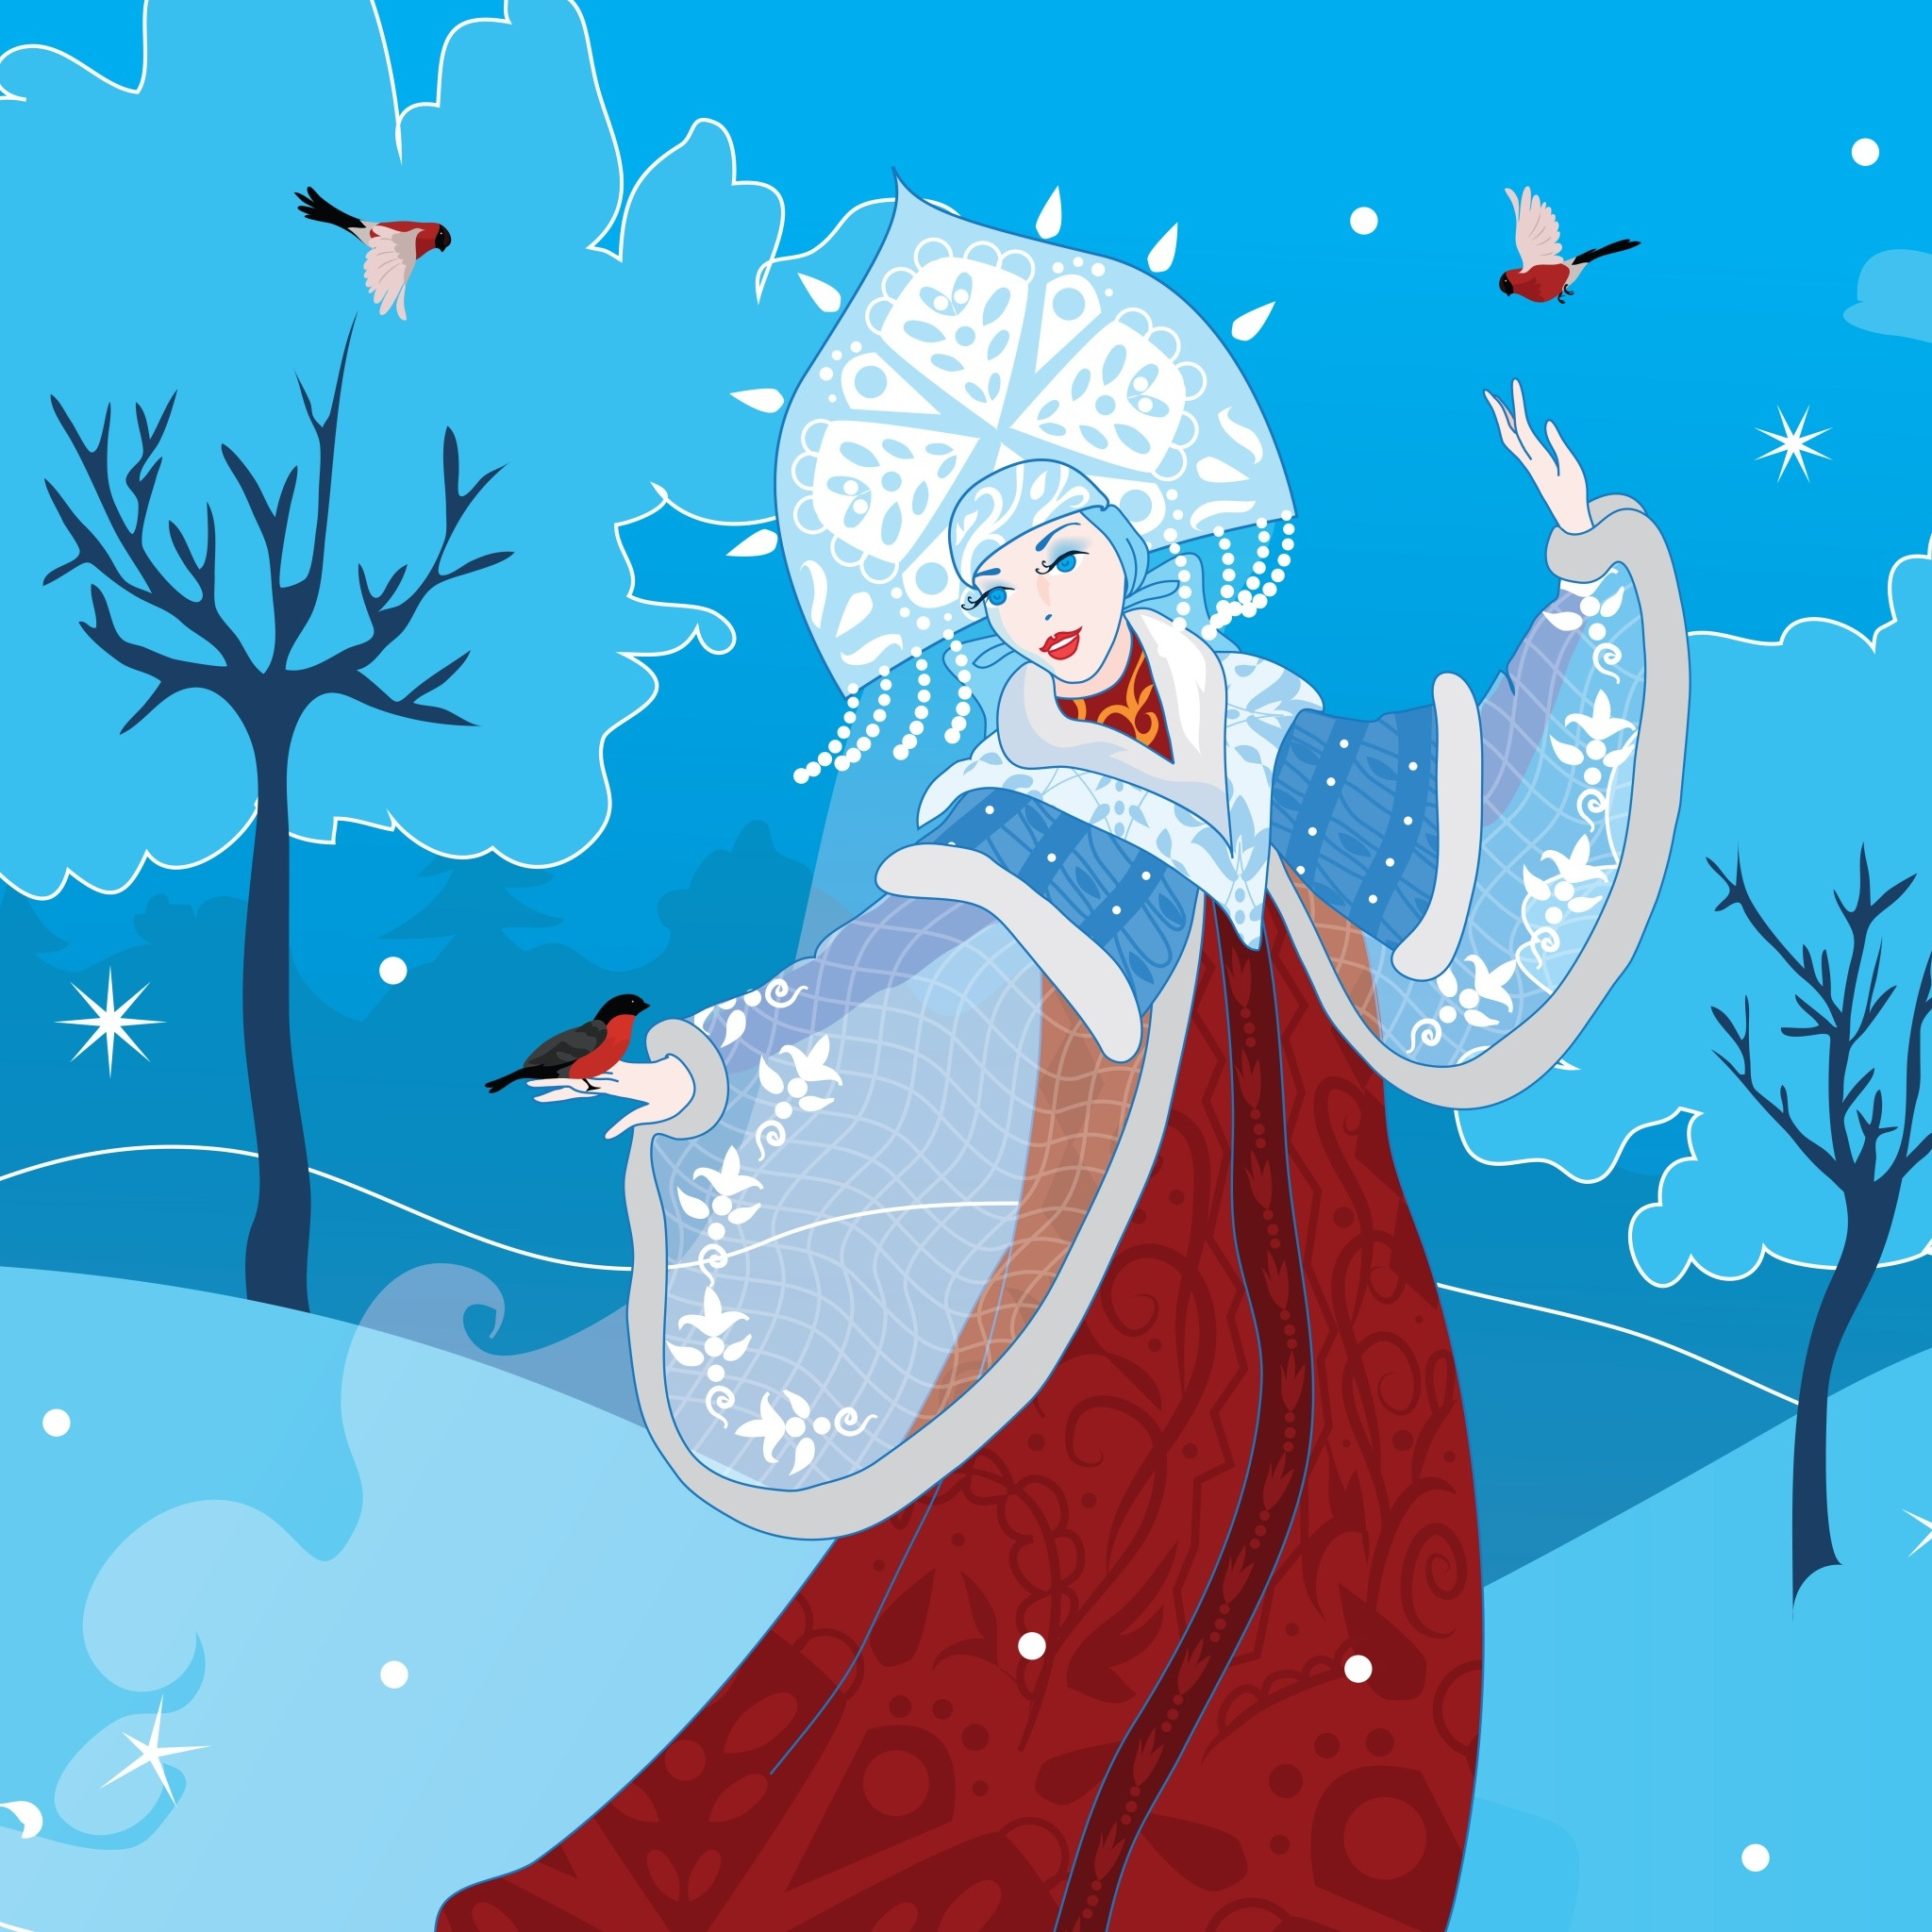 Russian Snow Maiden 3Wallpapers iPad Retina